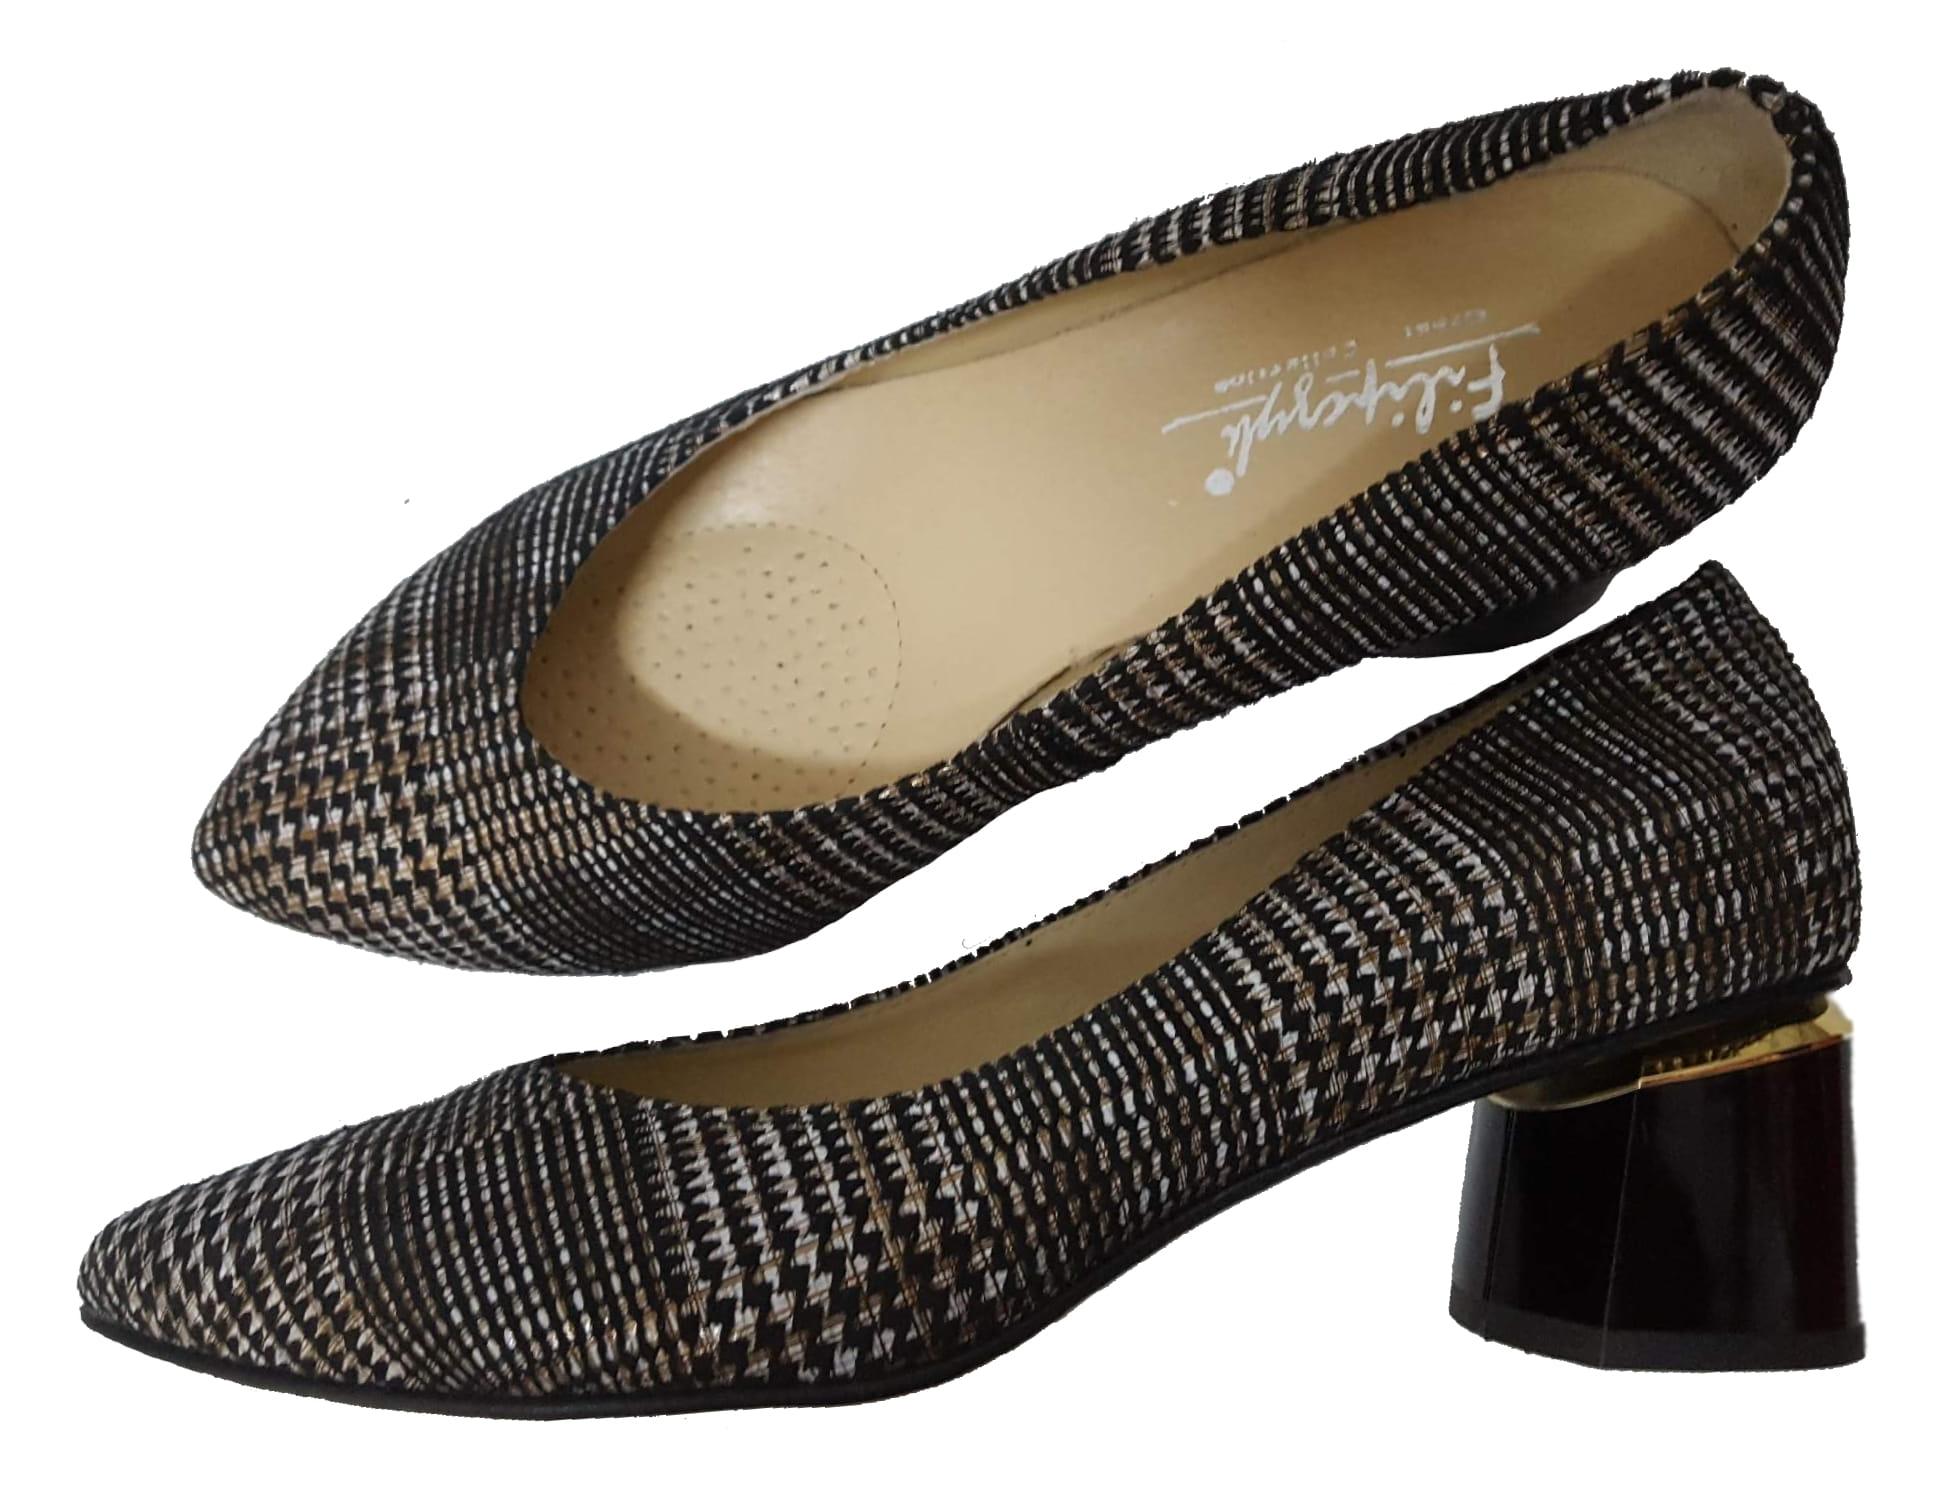 FK 9882W skóra naturalna różne kolory różne tęgości butów obcas 5 5,5 cm różne rodzaje skóry rozmiar 41 46